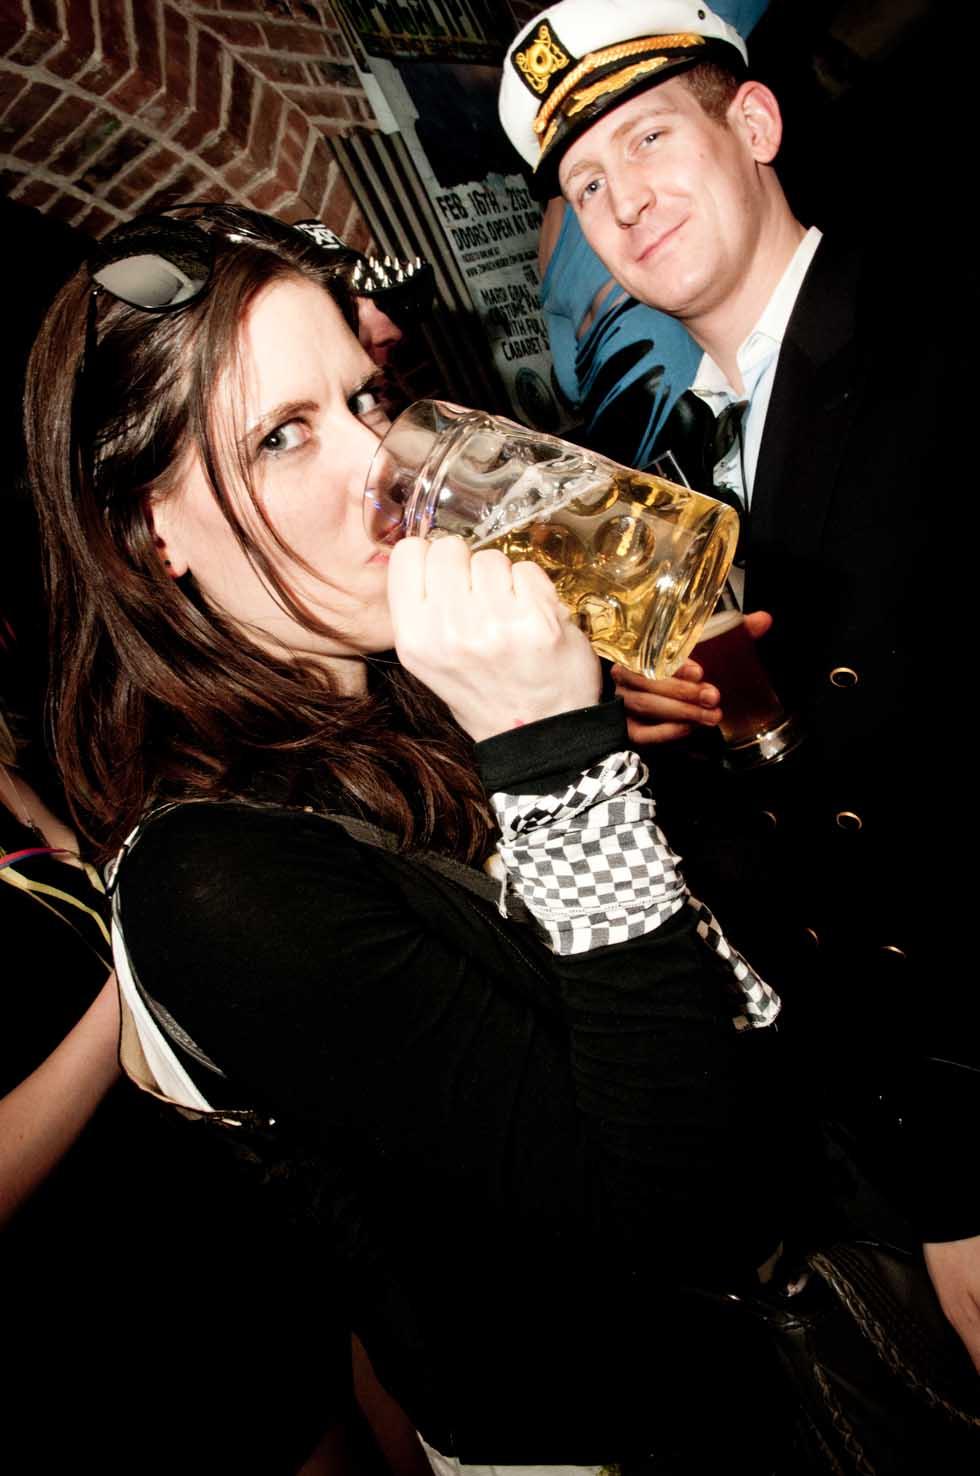 zum-schneider-nyc-2012-karneval-apocalyptika-3246.jpg